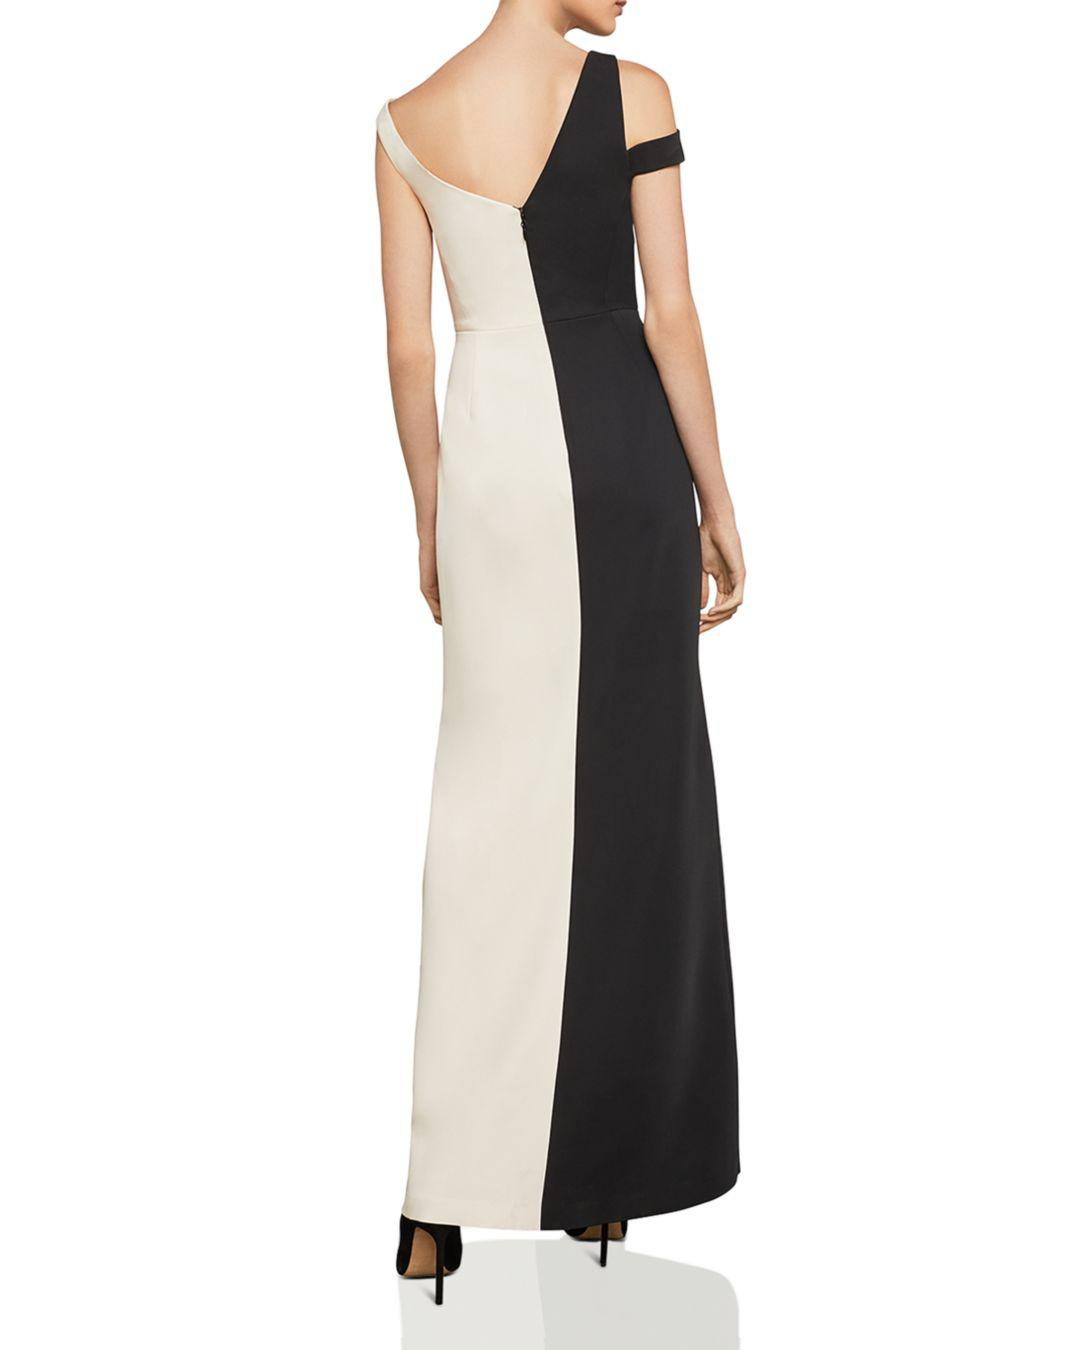 936686ca2c BCBGMAXAZRIA Asymmetric Color-block Gown in Black - Lyst